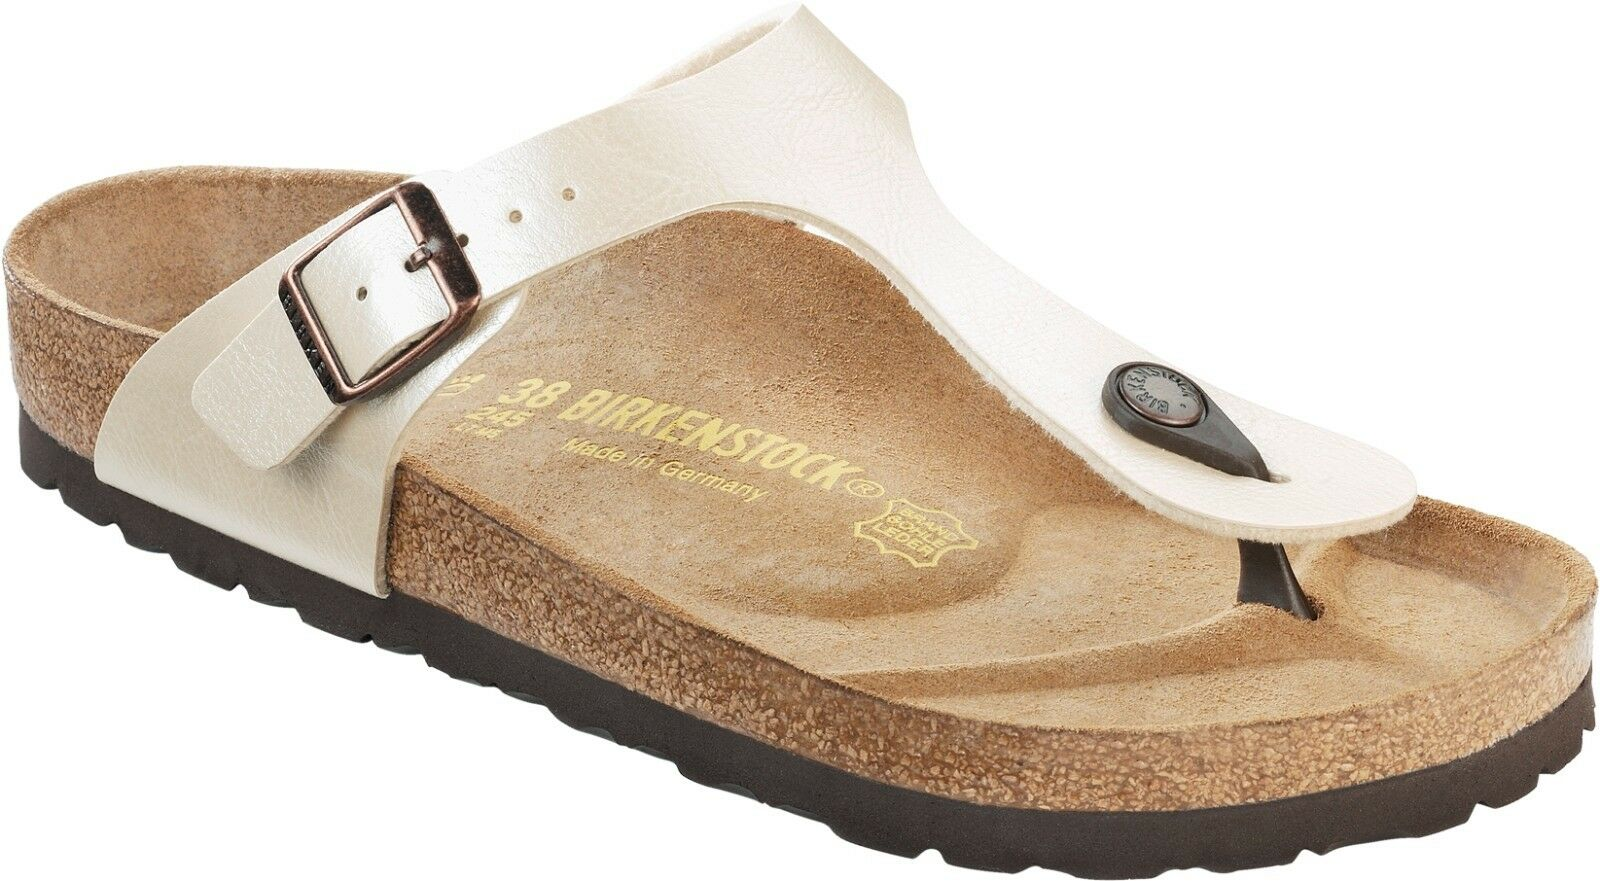 Birkenstock Gizeh Zehentrenner Graceful Antique Fußbett Lace 35-43 normales Fußbett Antique d4b563